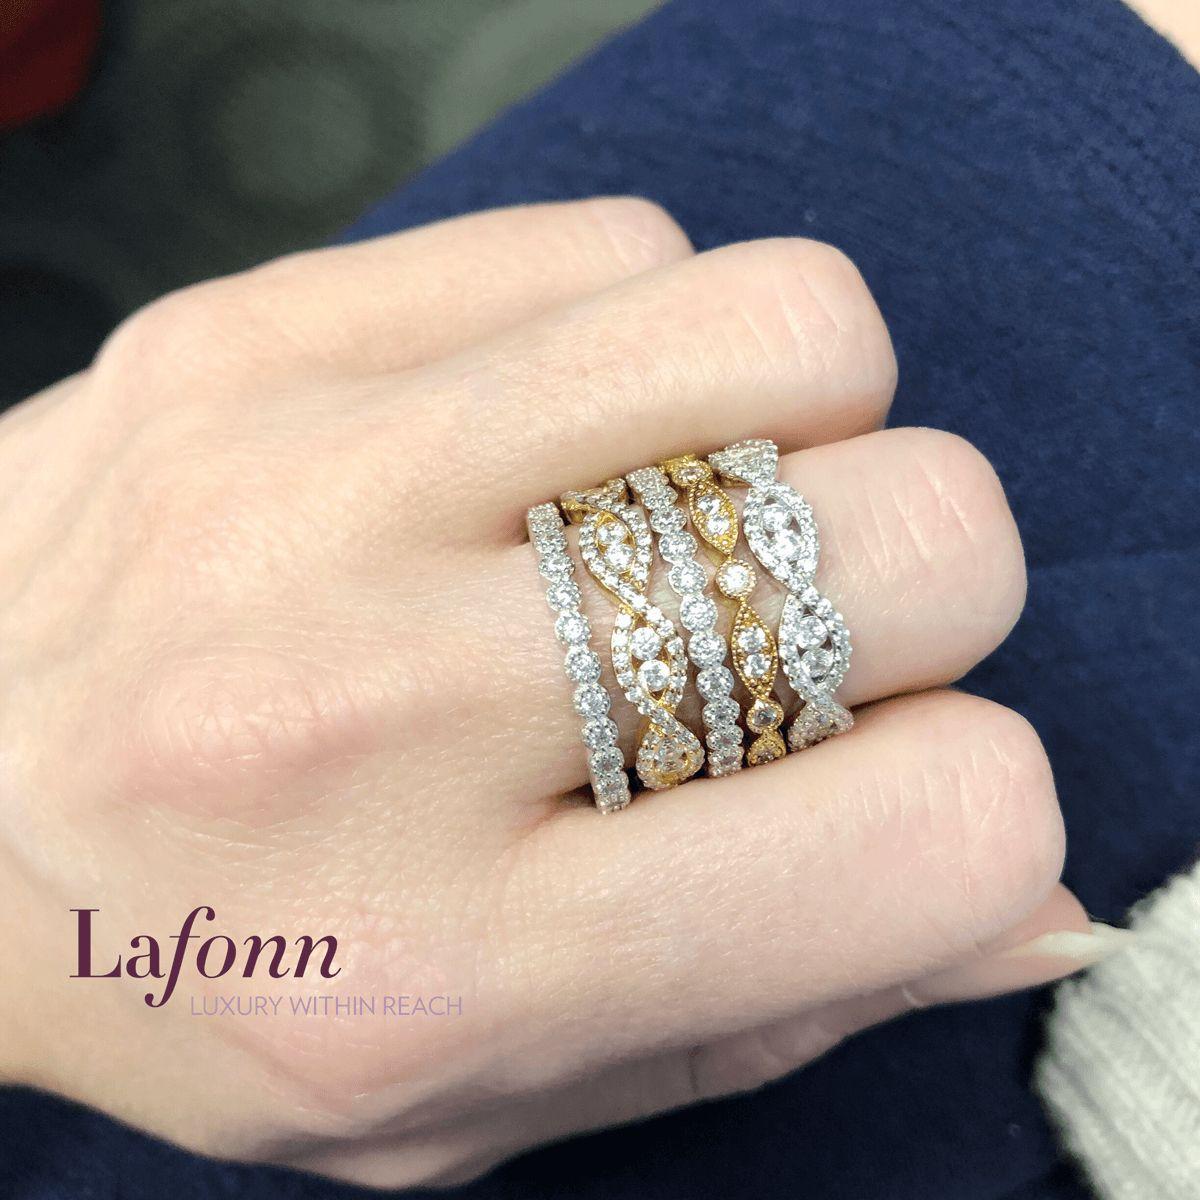 Stack Up The Style With Lafonn Simulated Diamond Rings From 110 Glatzjewelers Lafonn Lafonnret Gold Wedding Jewelry Jewelry Diamond Engagement Rings